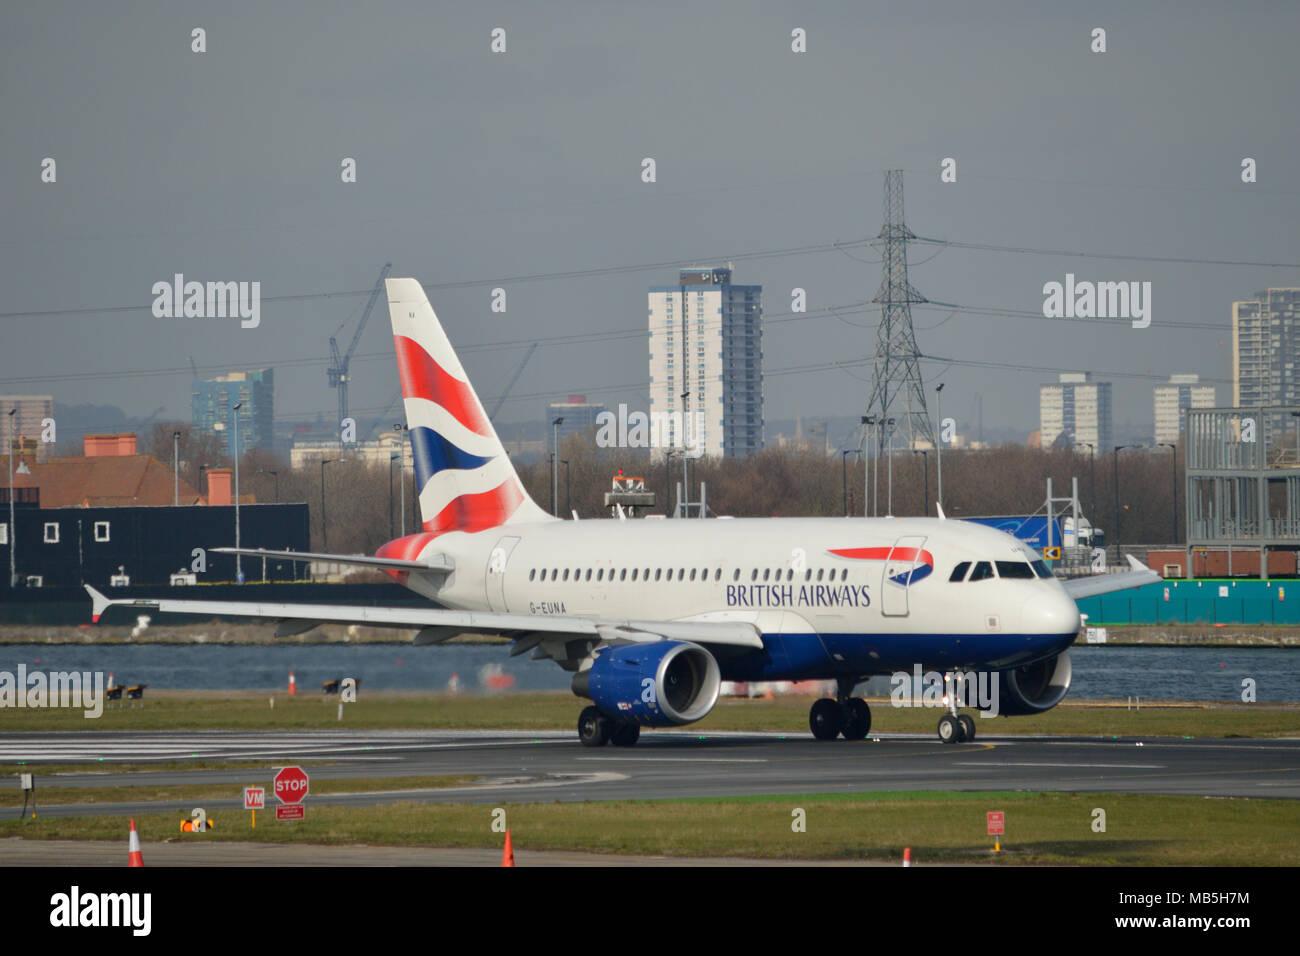 British Airways Airbus 318 aircraft taxiing at London City Airport - Stock Image